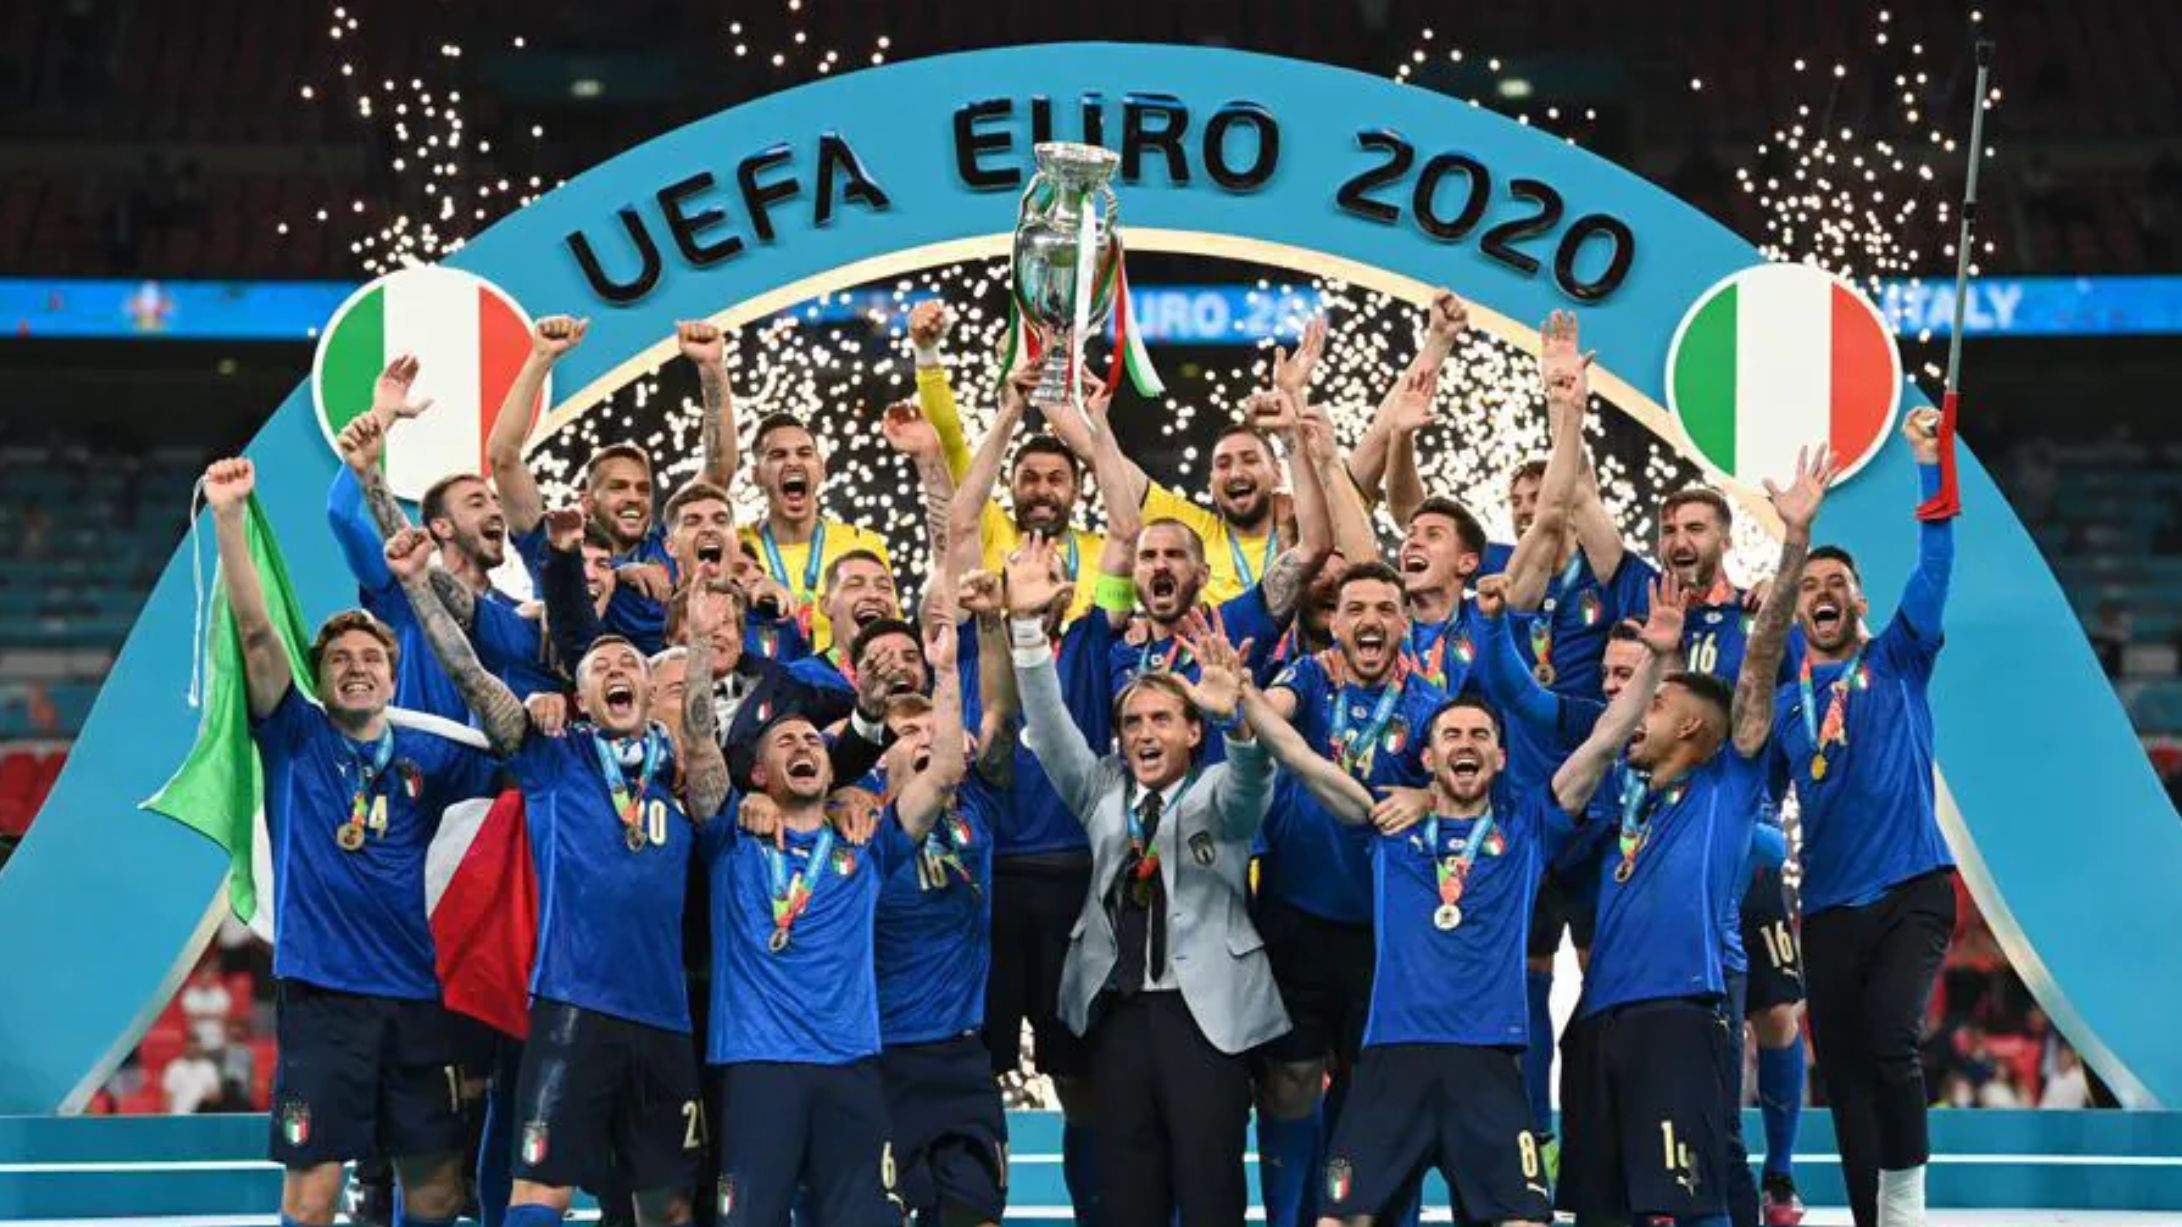 Campioni d'europa 2020